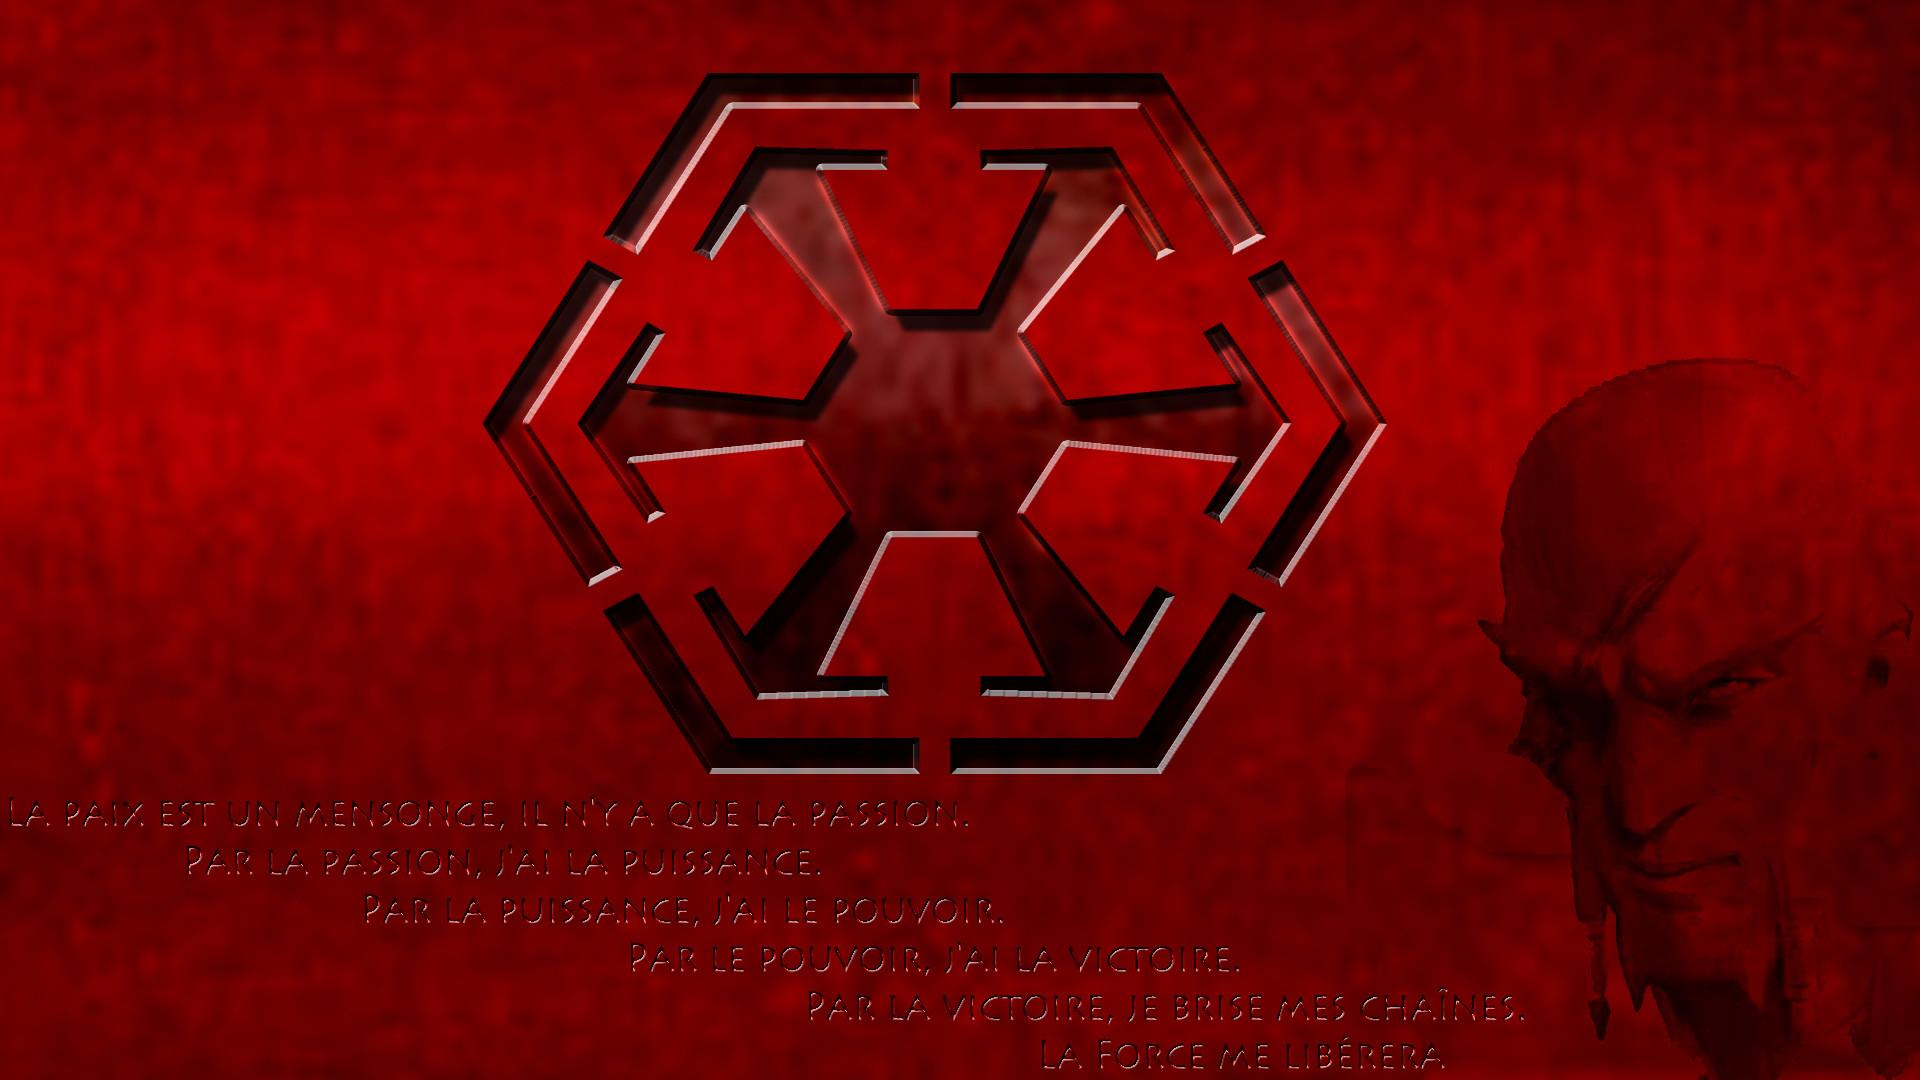 … Fond Ecran Sith Code by schlacvuck